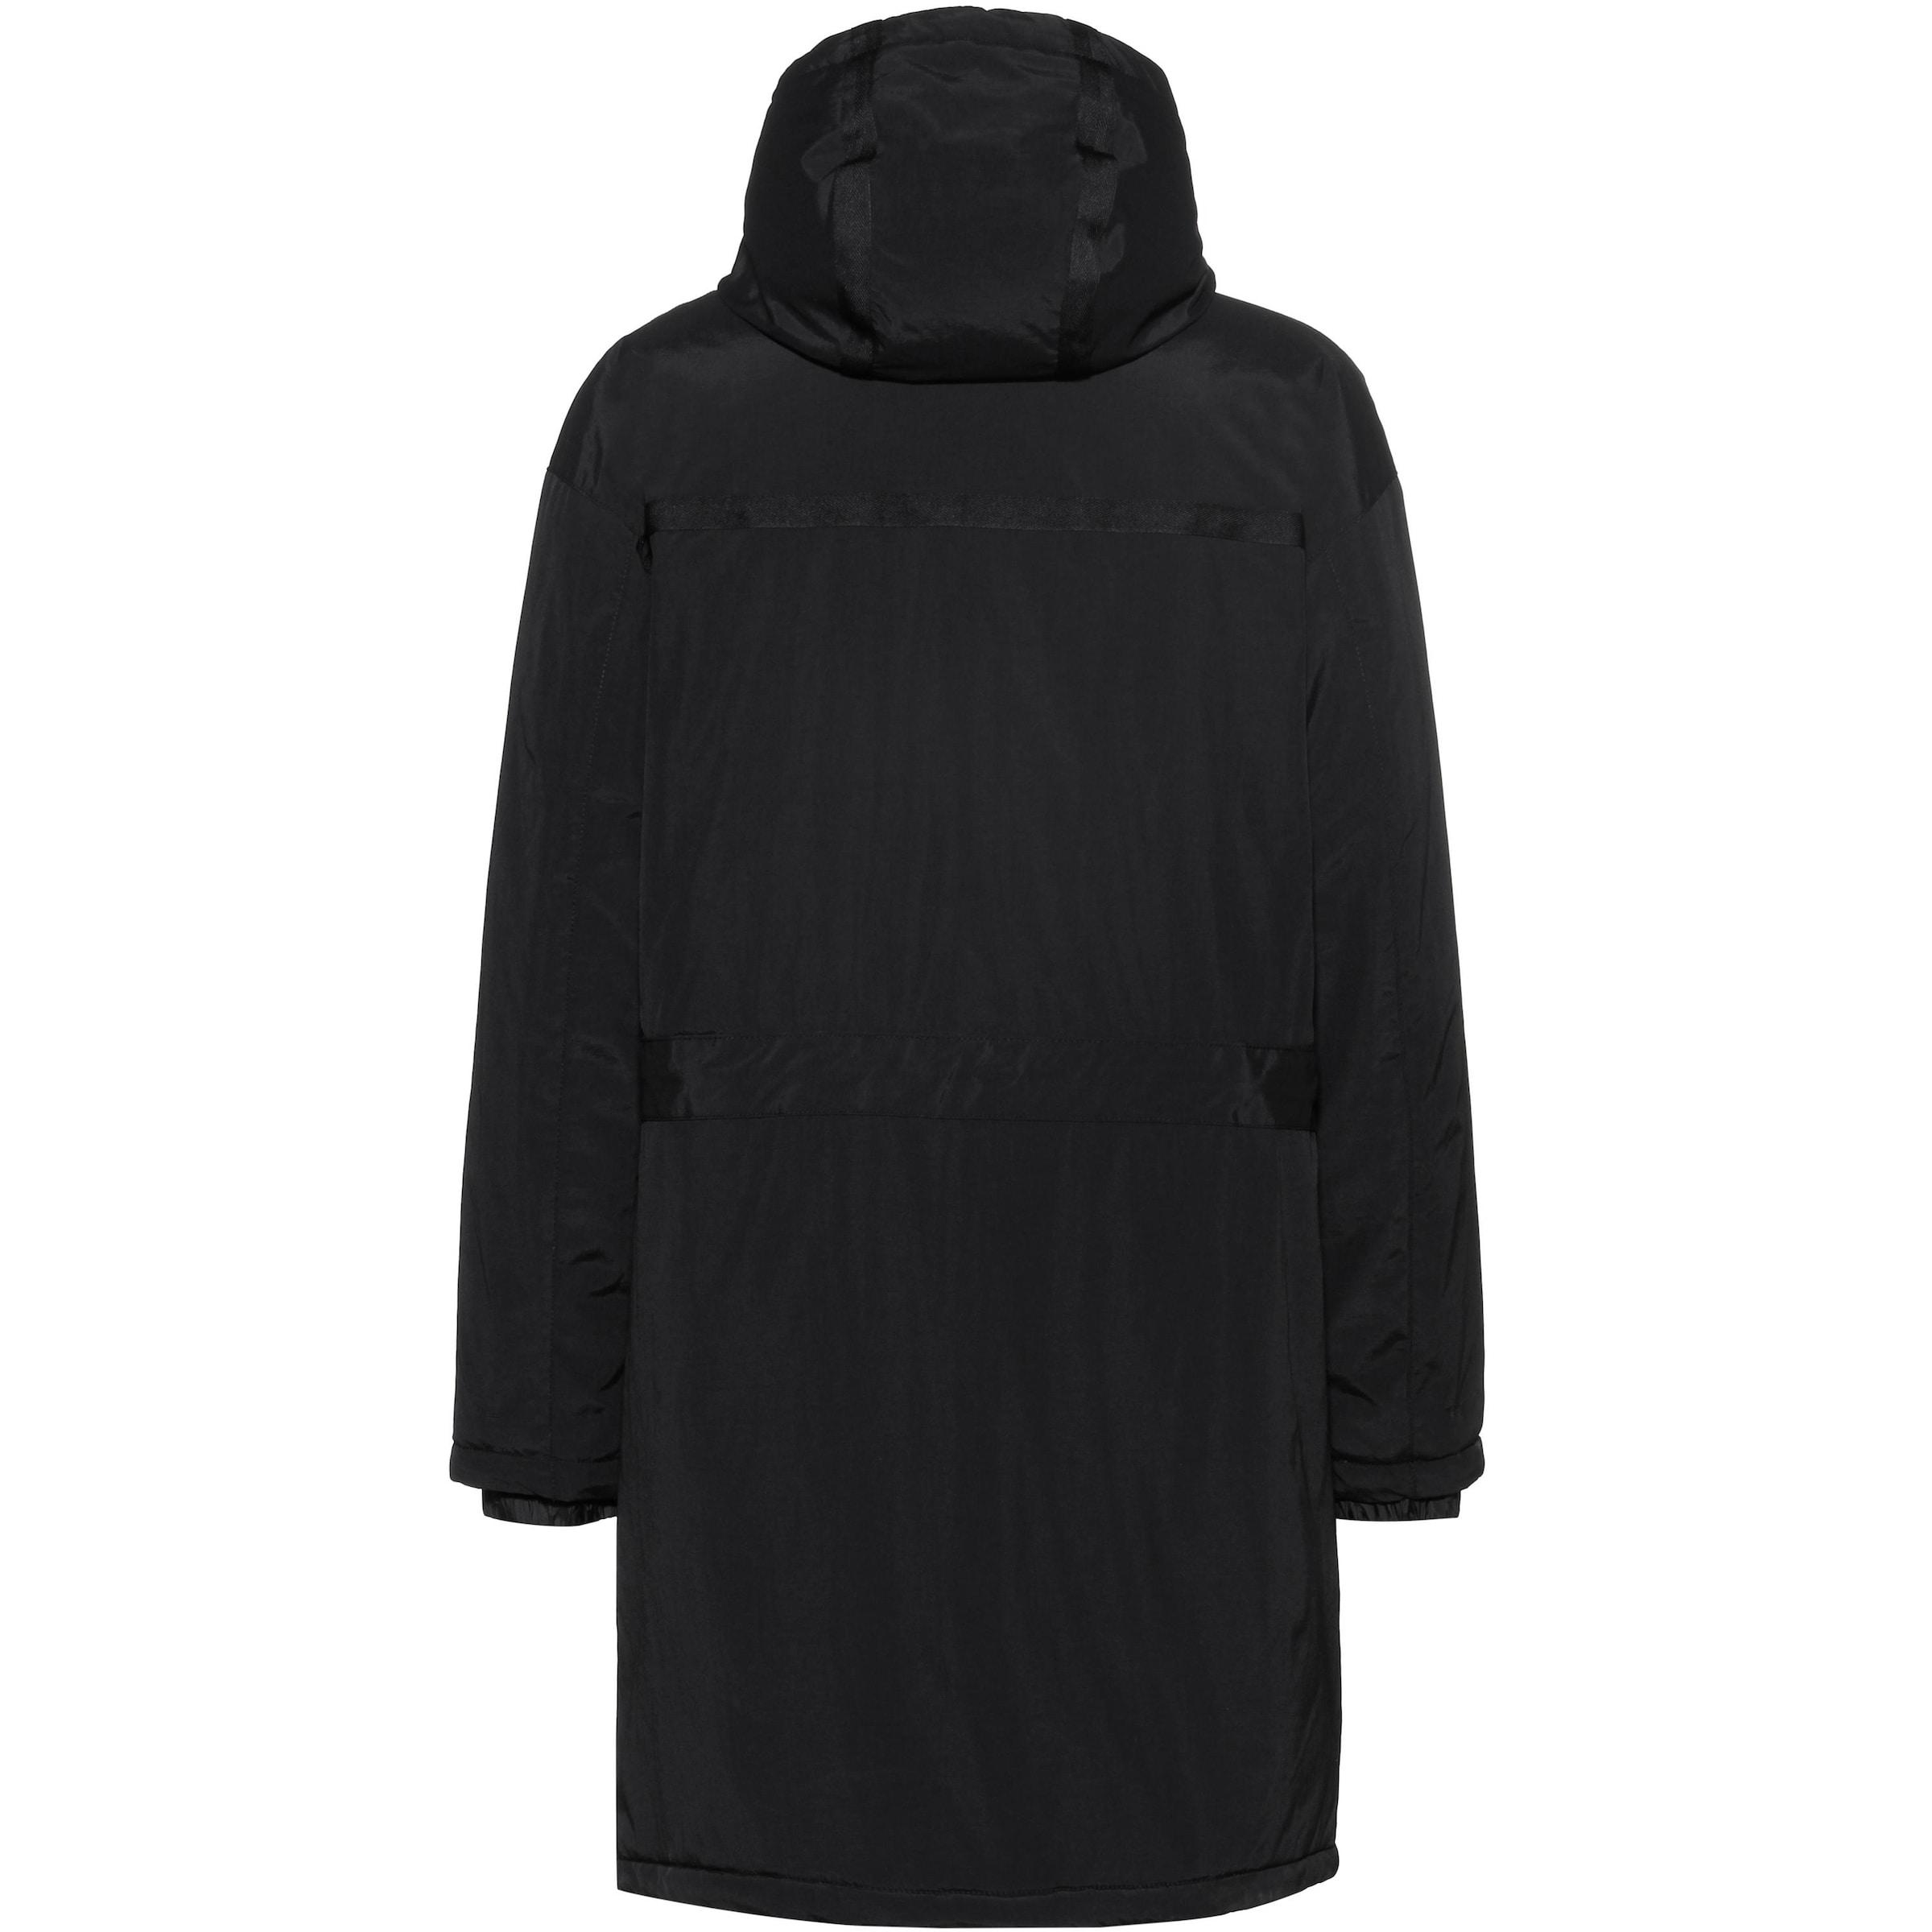 NAPAPIJRI Parka 'Skidoo Creator' in schwarz Leicht gefüttert 336805001